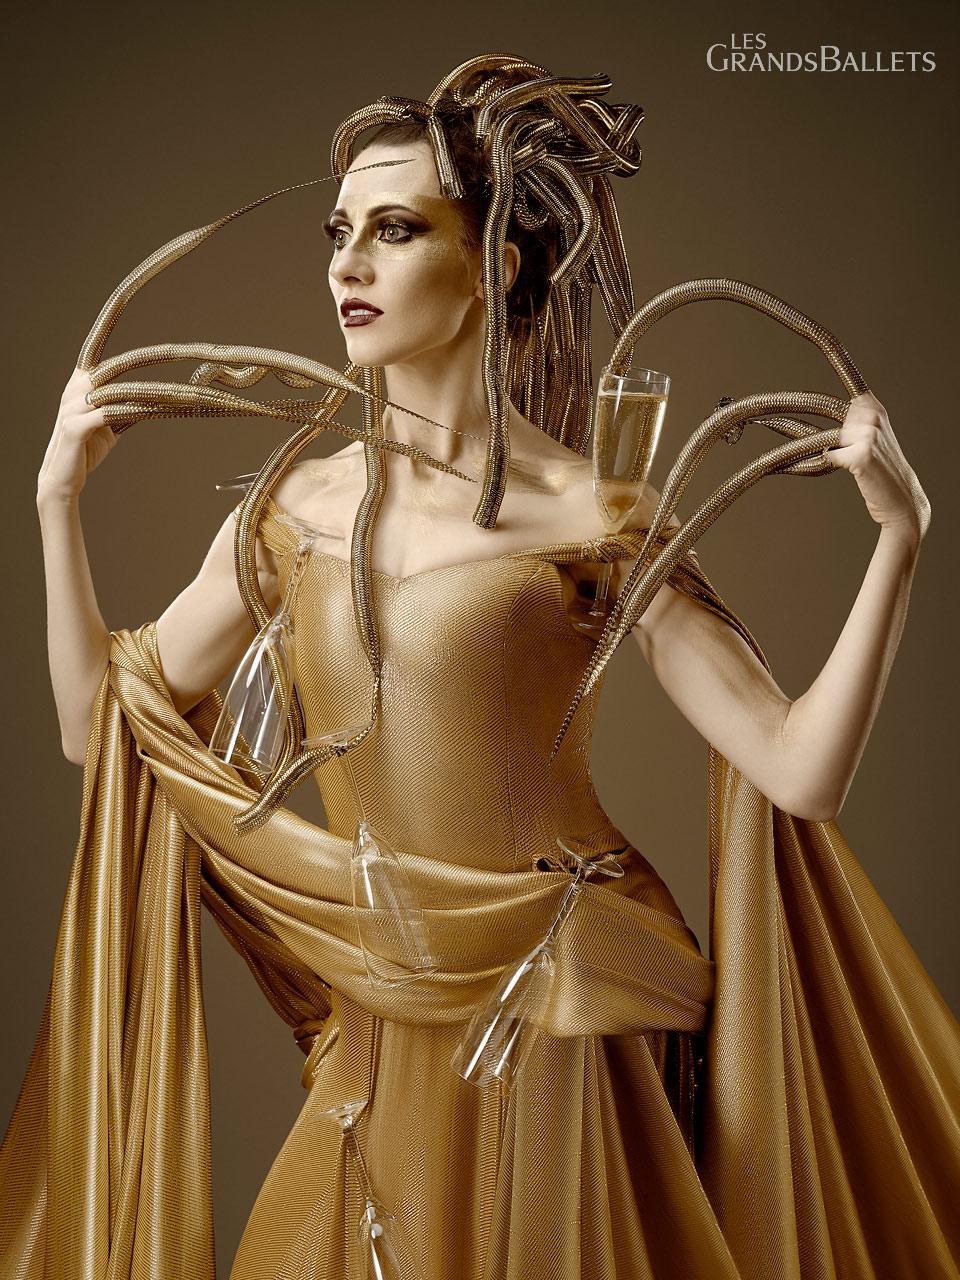 Montreal_Dance_Photographer_Les_Grands_Ballets_77211-1.jpg